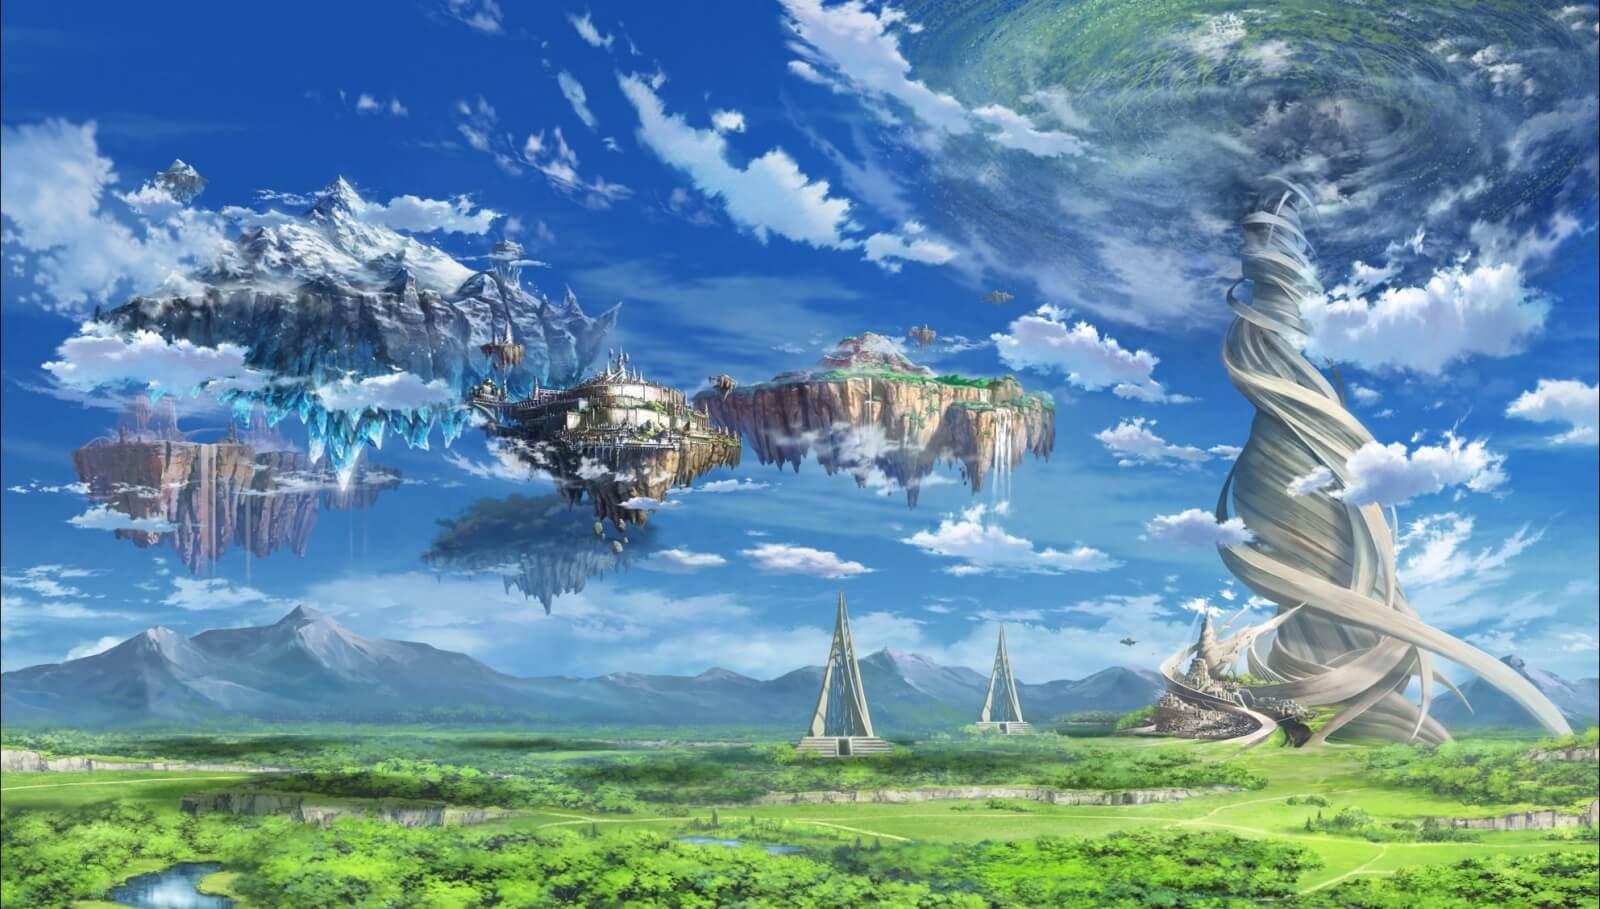 anime-phong-canh-huyen-ao10